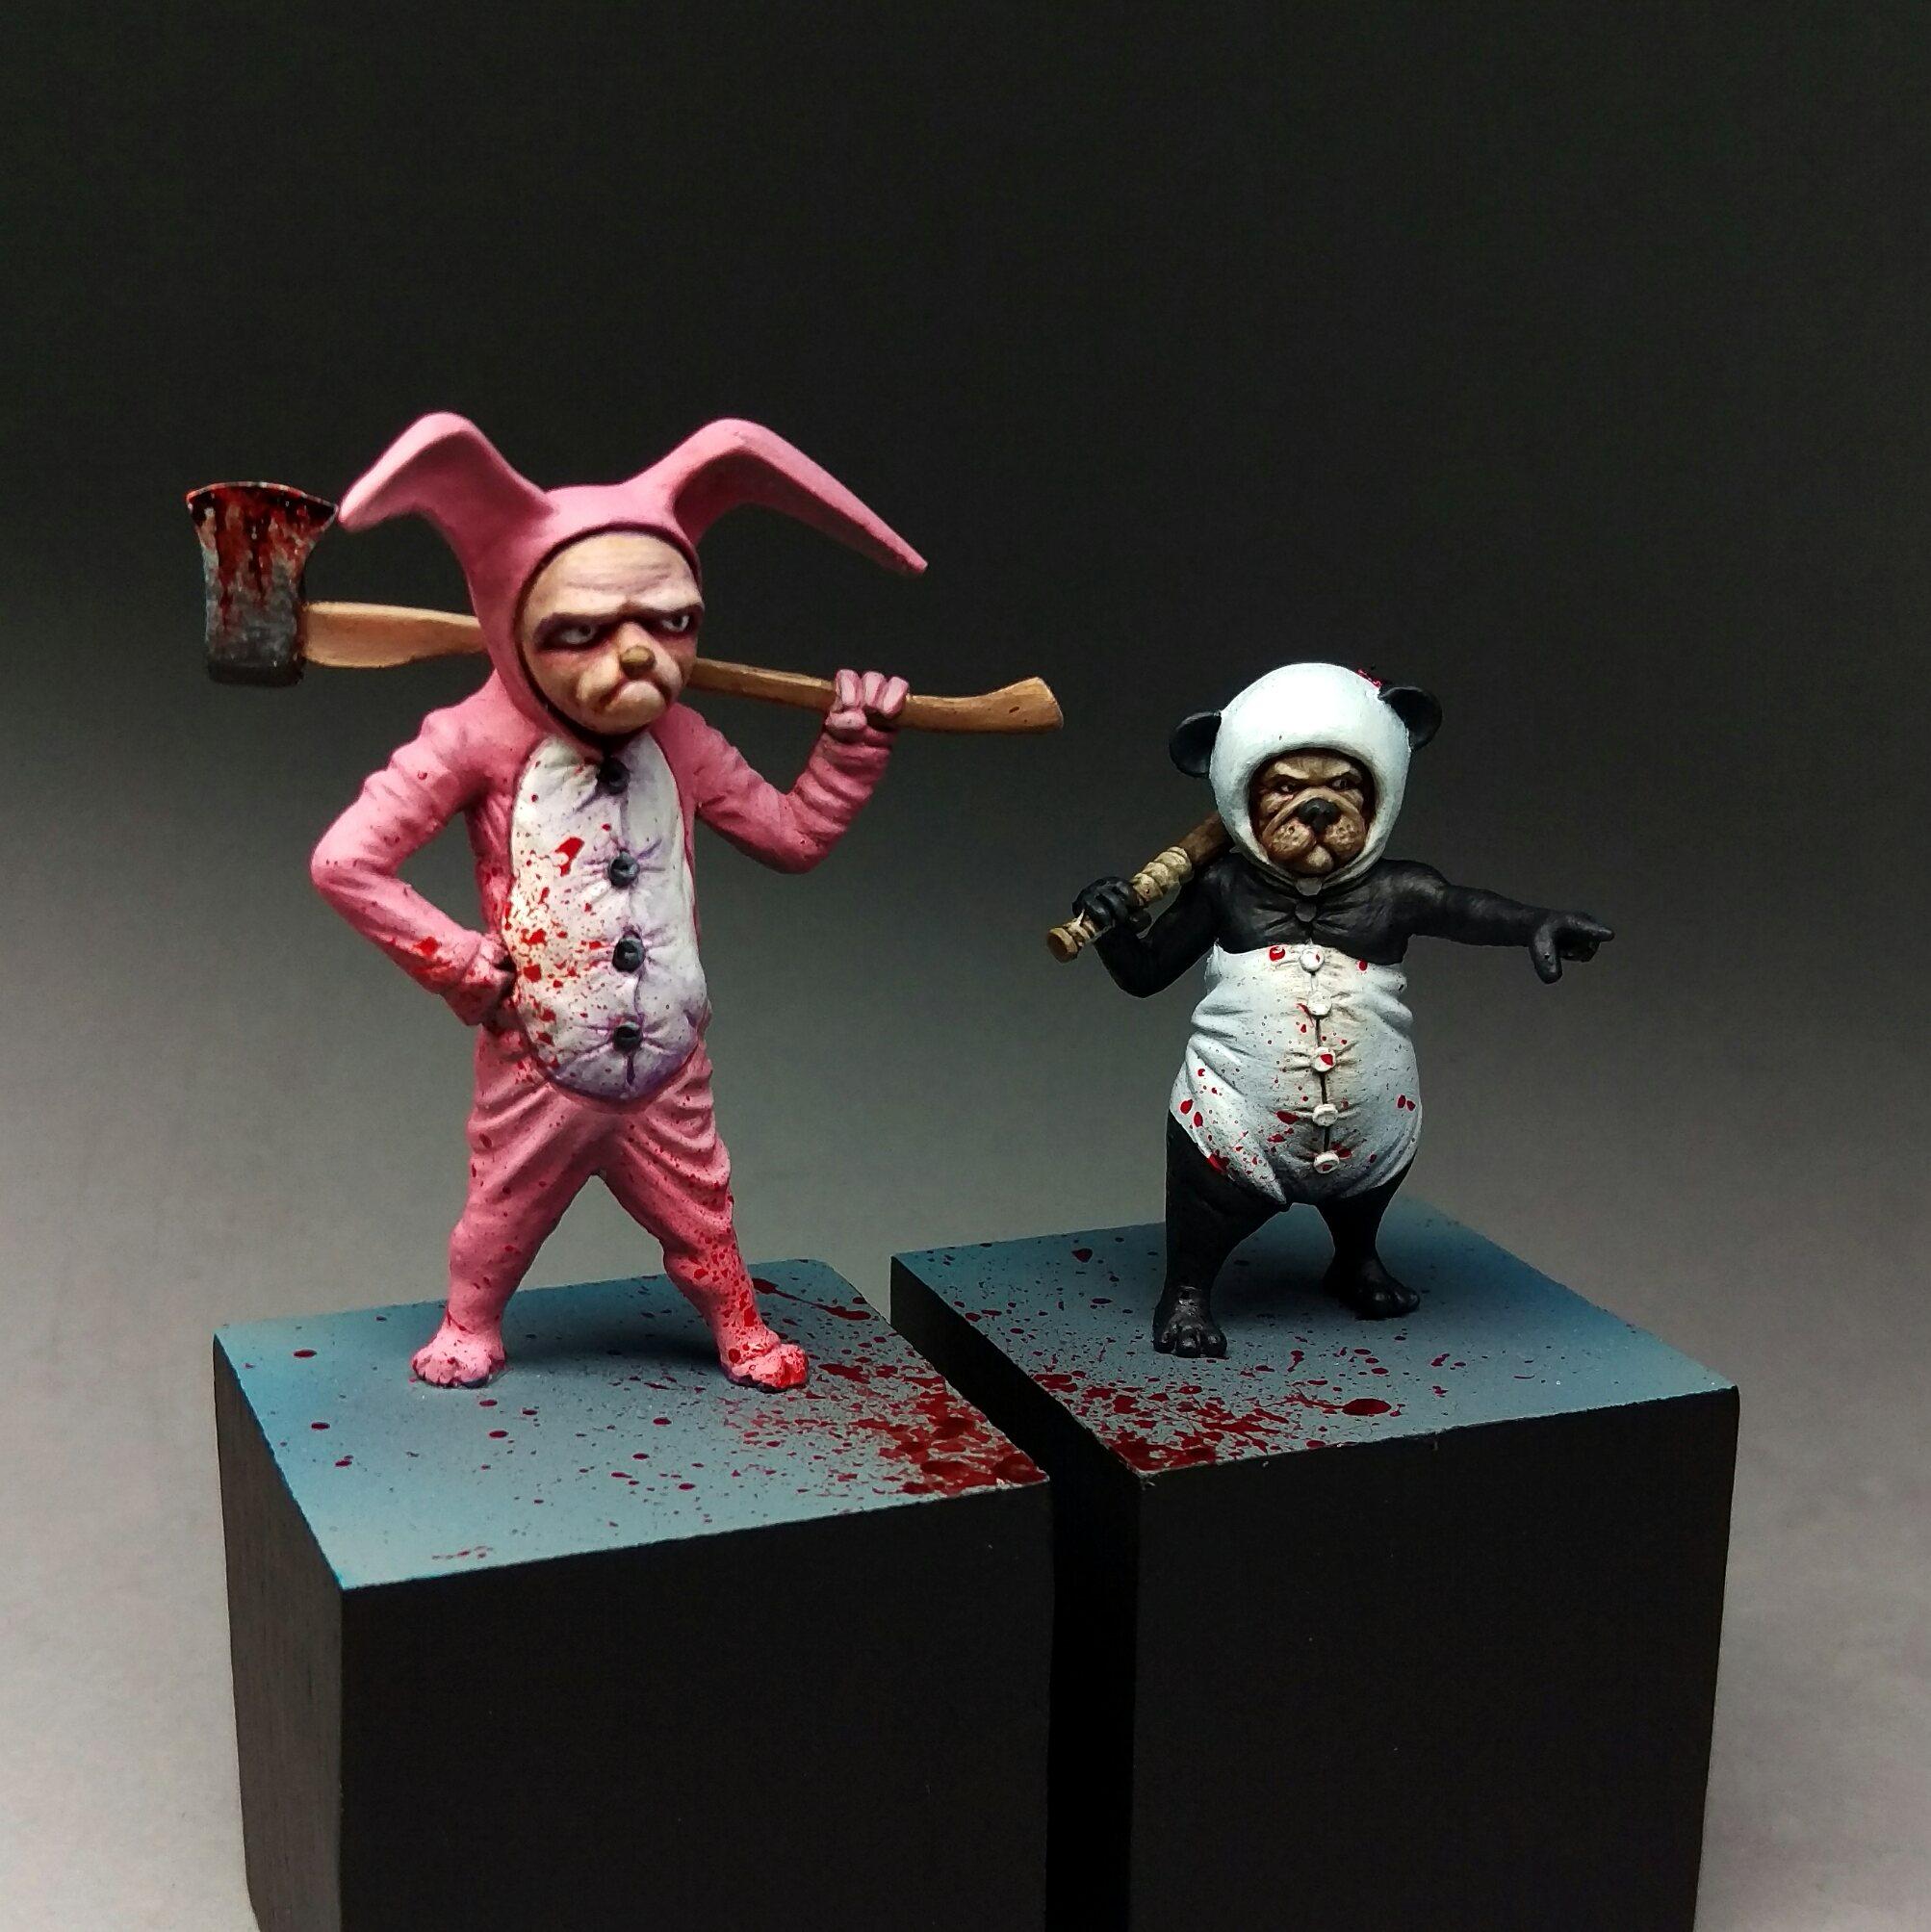 Pugsy Malone & Grumpy Bunny